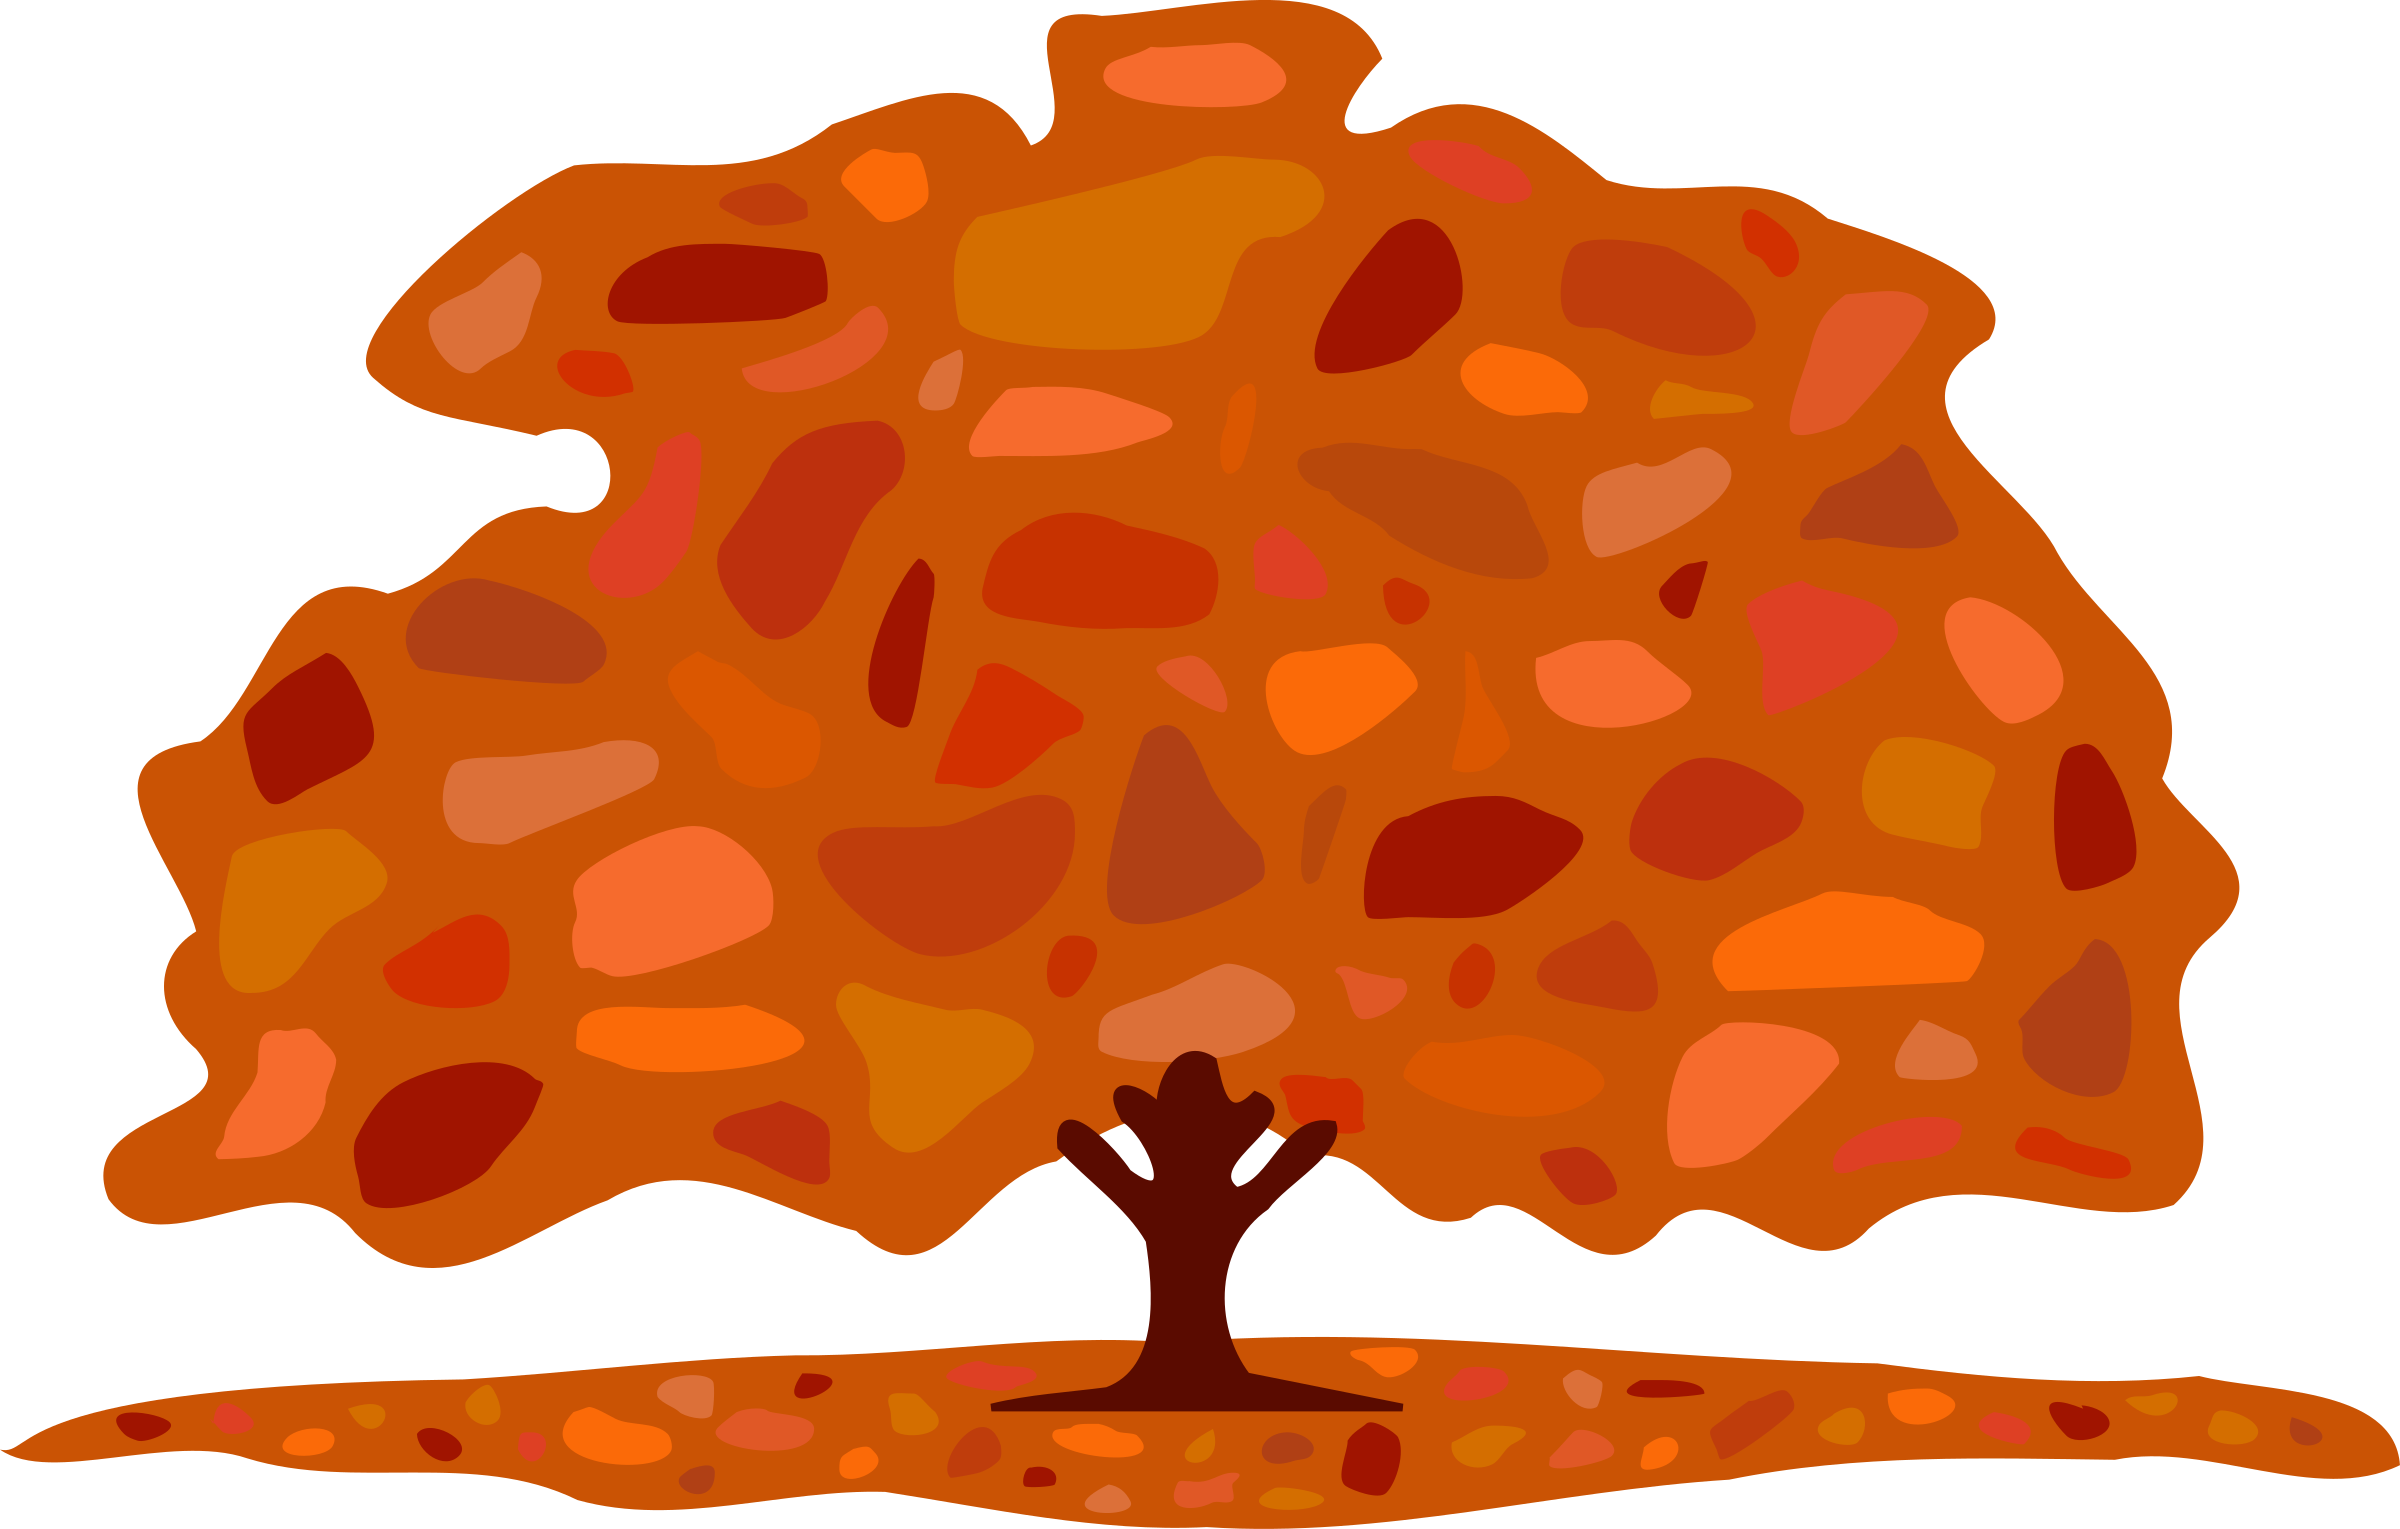 Autumn tree clipart royalty free Clipart - Autumn tree royalty free